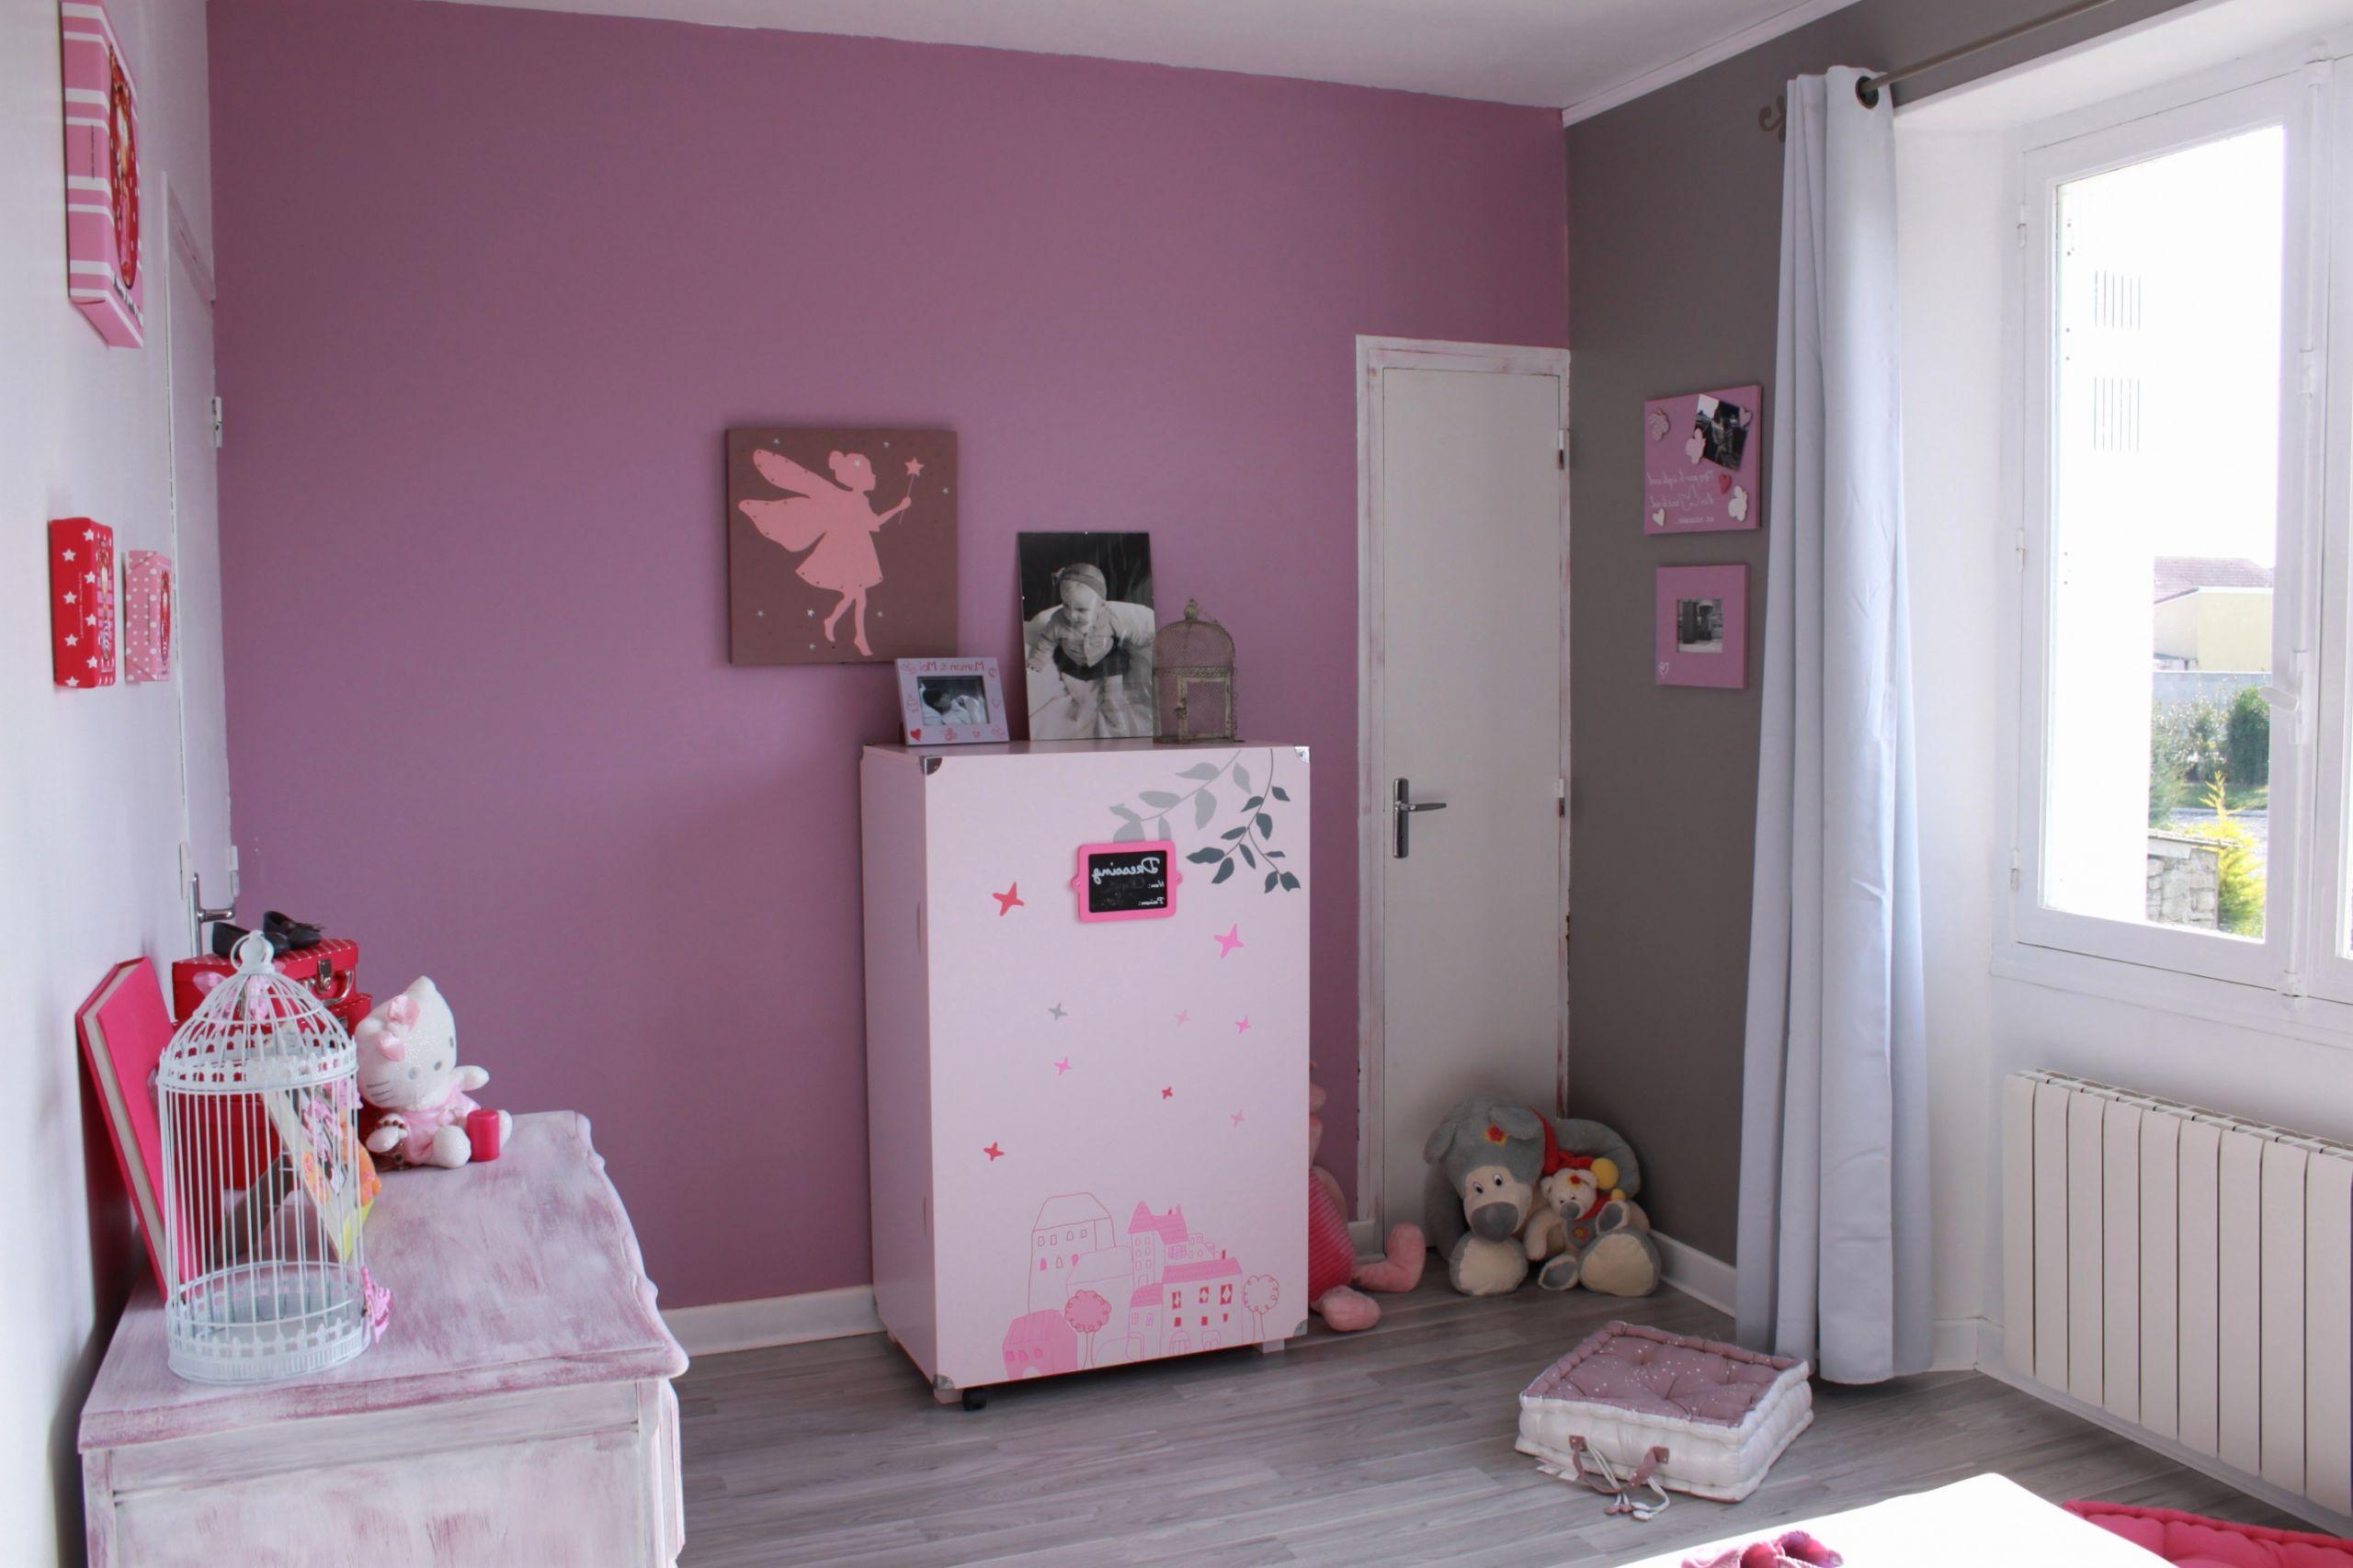 deco chambre ado fille 17 ans frais chambre design 16 wie folgt kann idee chambre d ado fille of idee chambre d ado fille 1